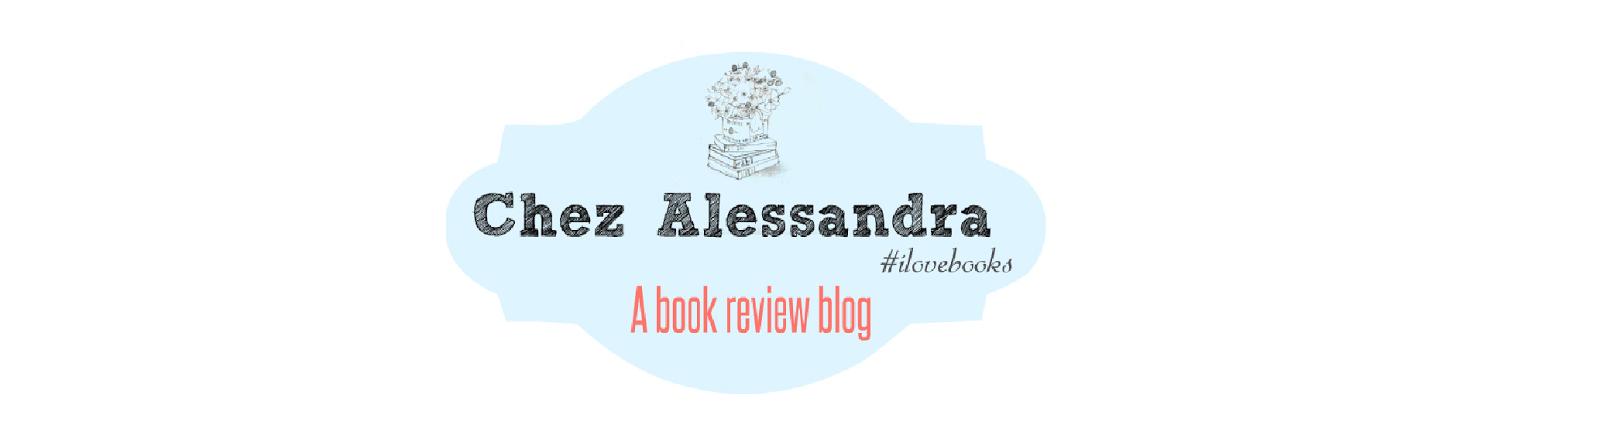 Chez Alessandra